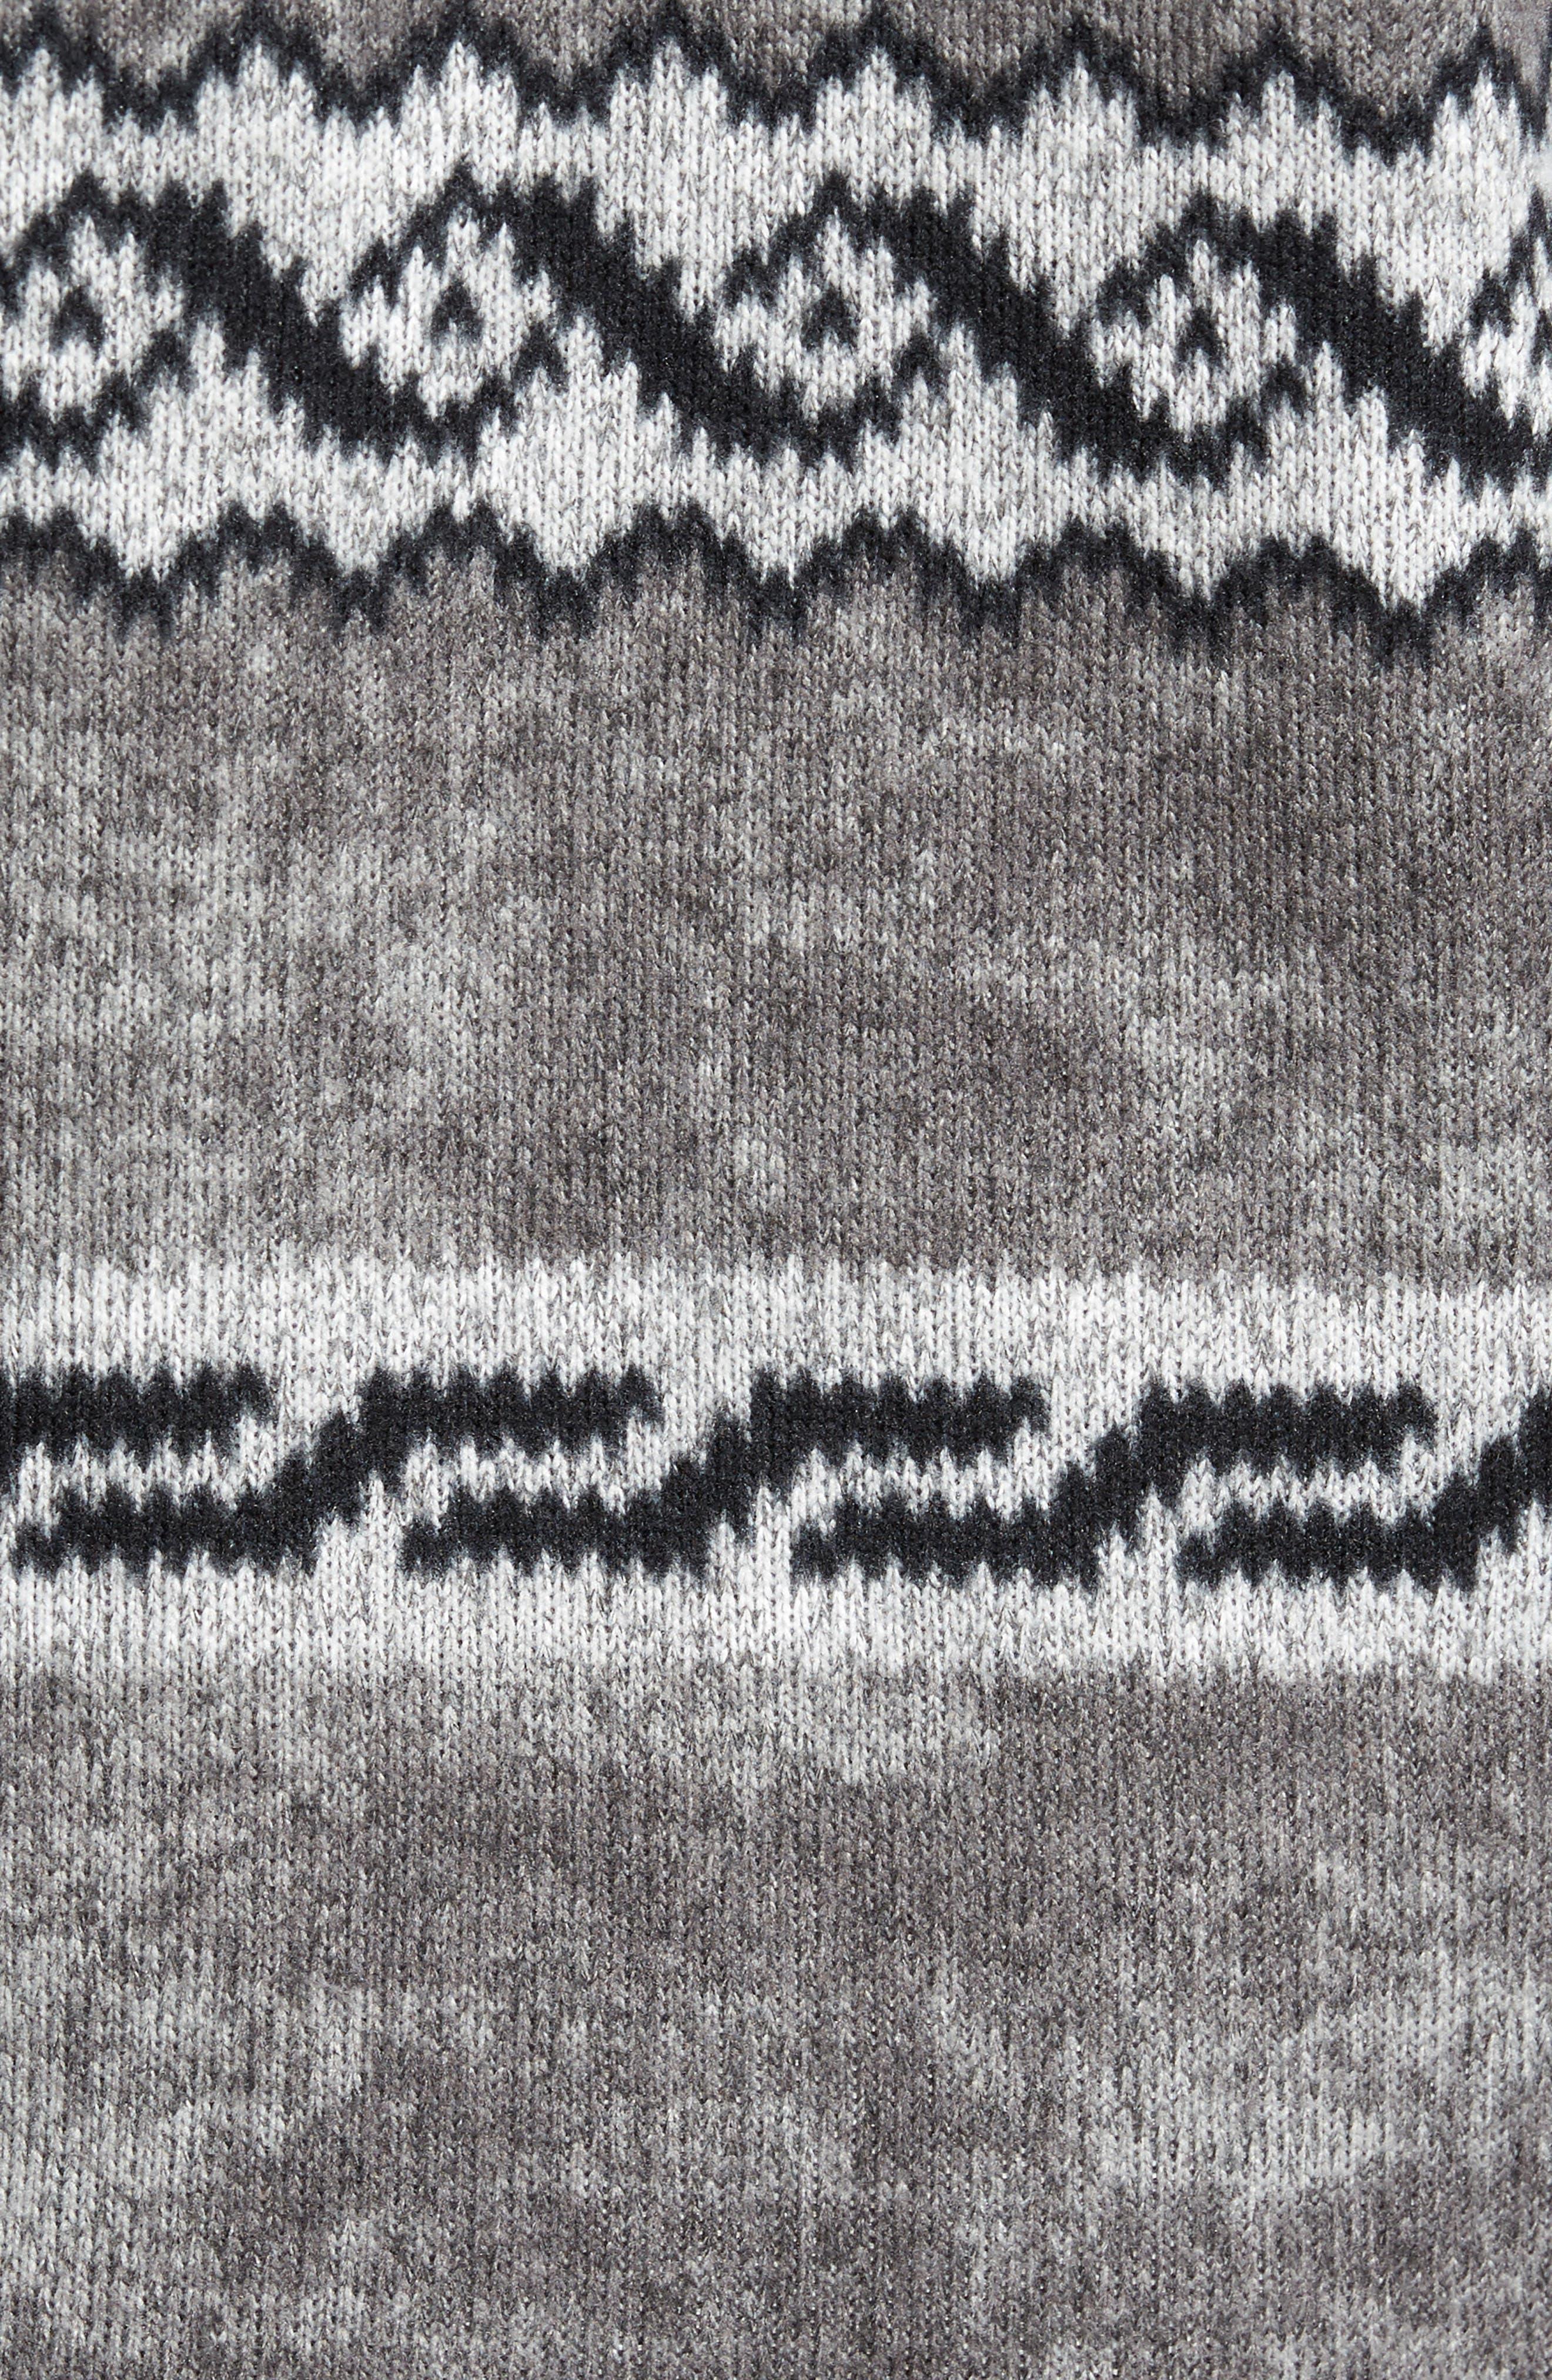 THE NORTH FACE,                             Gordon Lyons Plaid Pullover,                             Alternate thumbnail 5, color,                             022